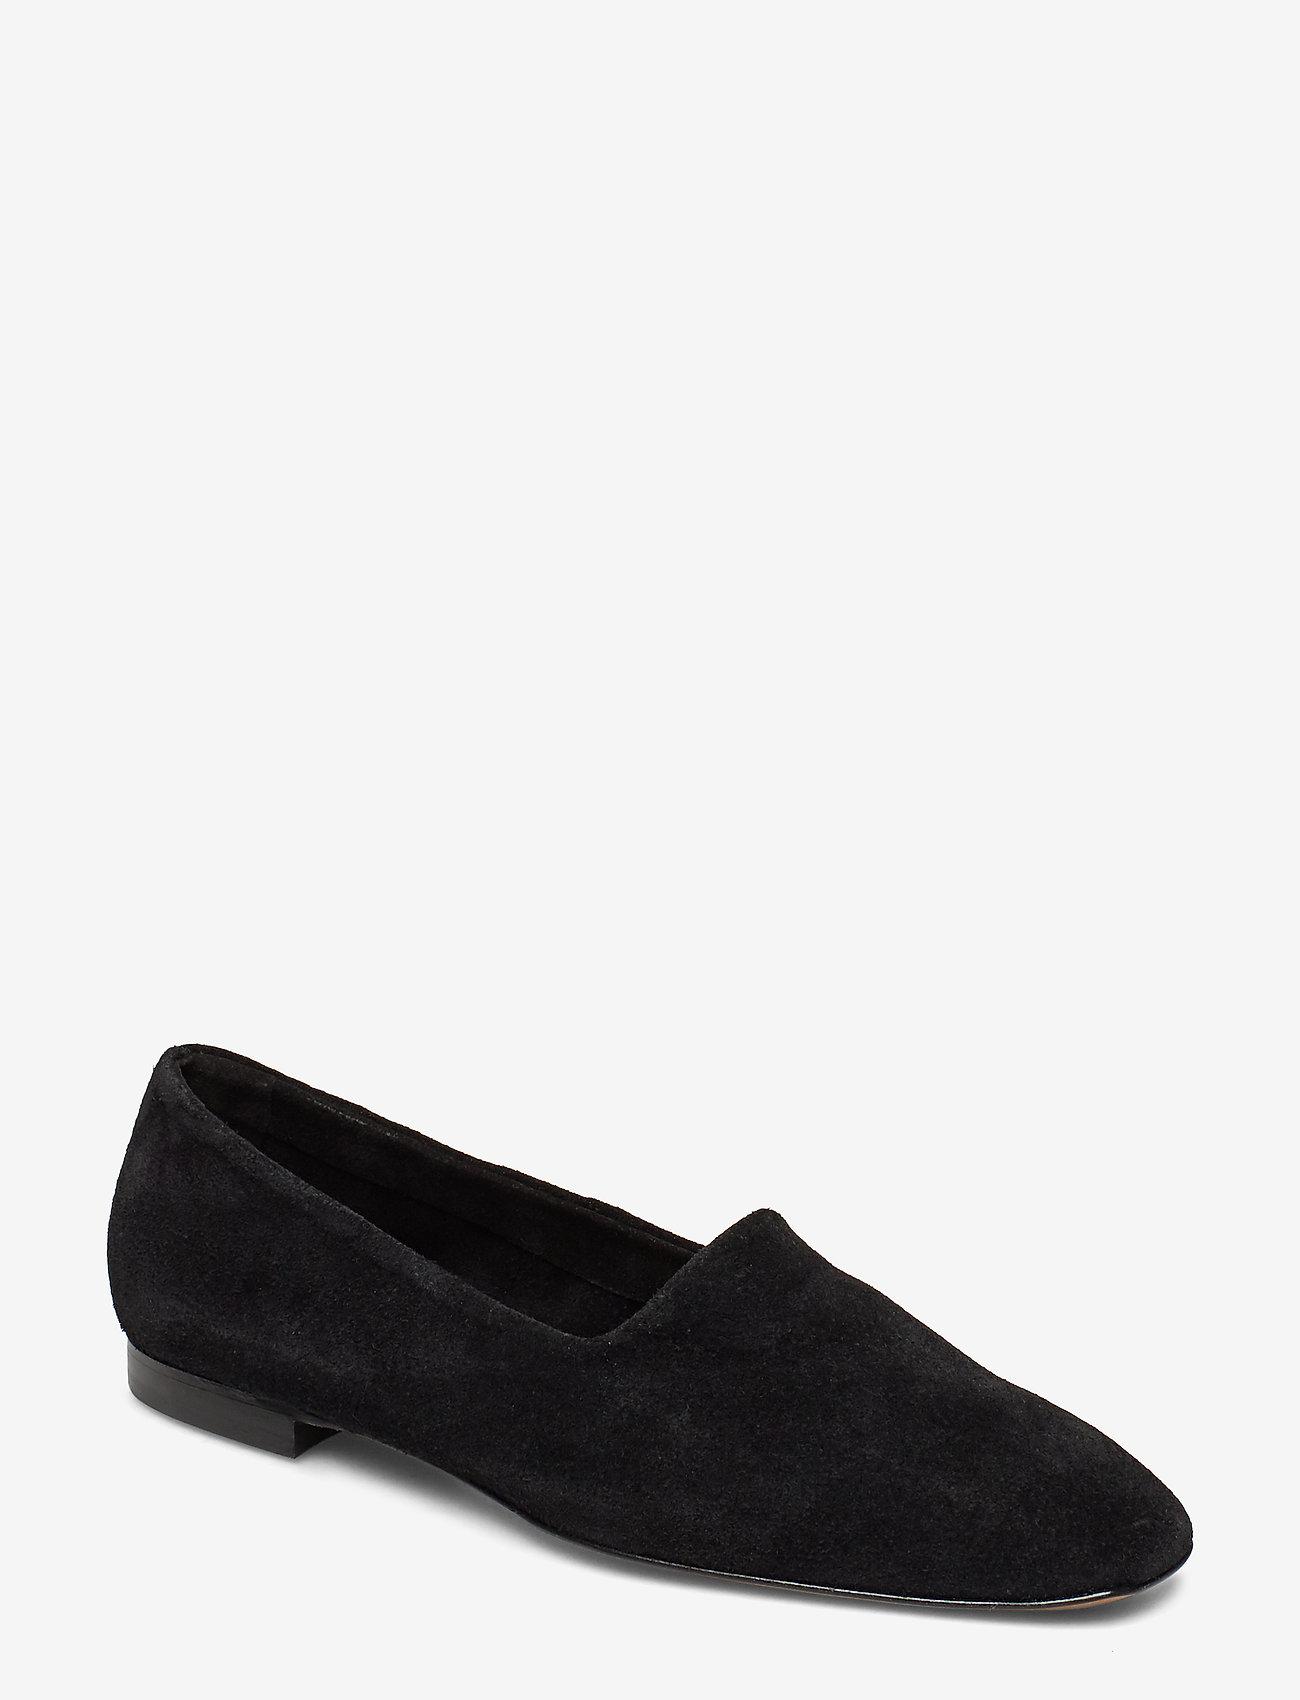 ATP Atelier - Andrano Black Suede - shoes - black - 0